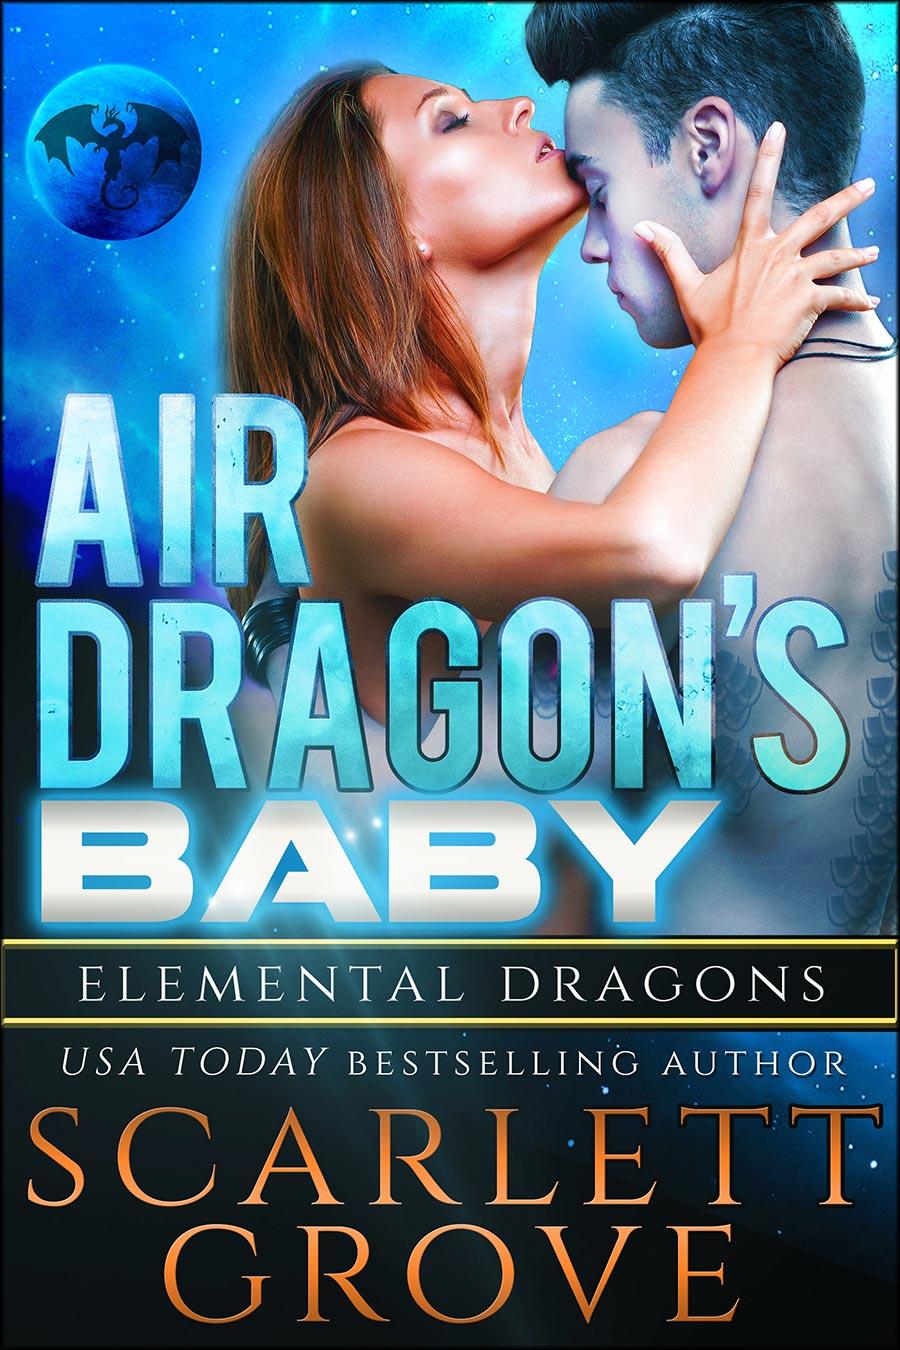 Scarlet-Grove---Alien-Dragon-Princes---Air-Dragons-Baby.jpg